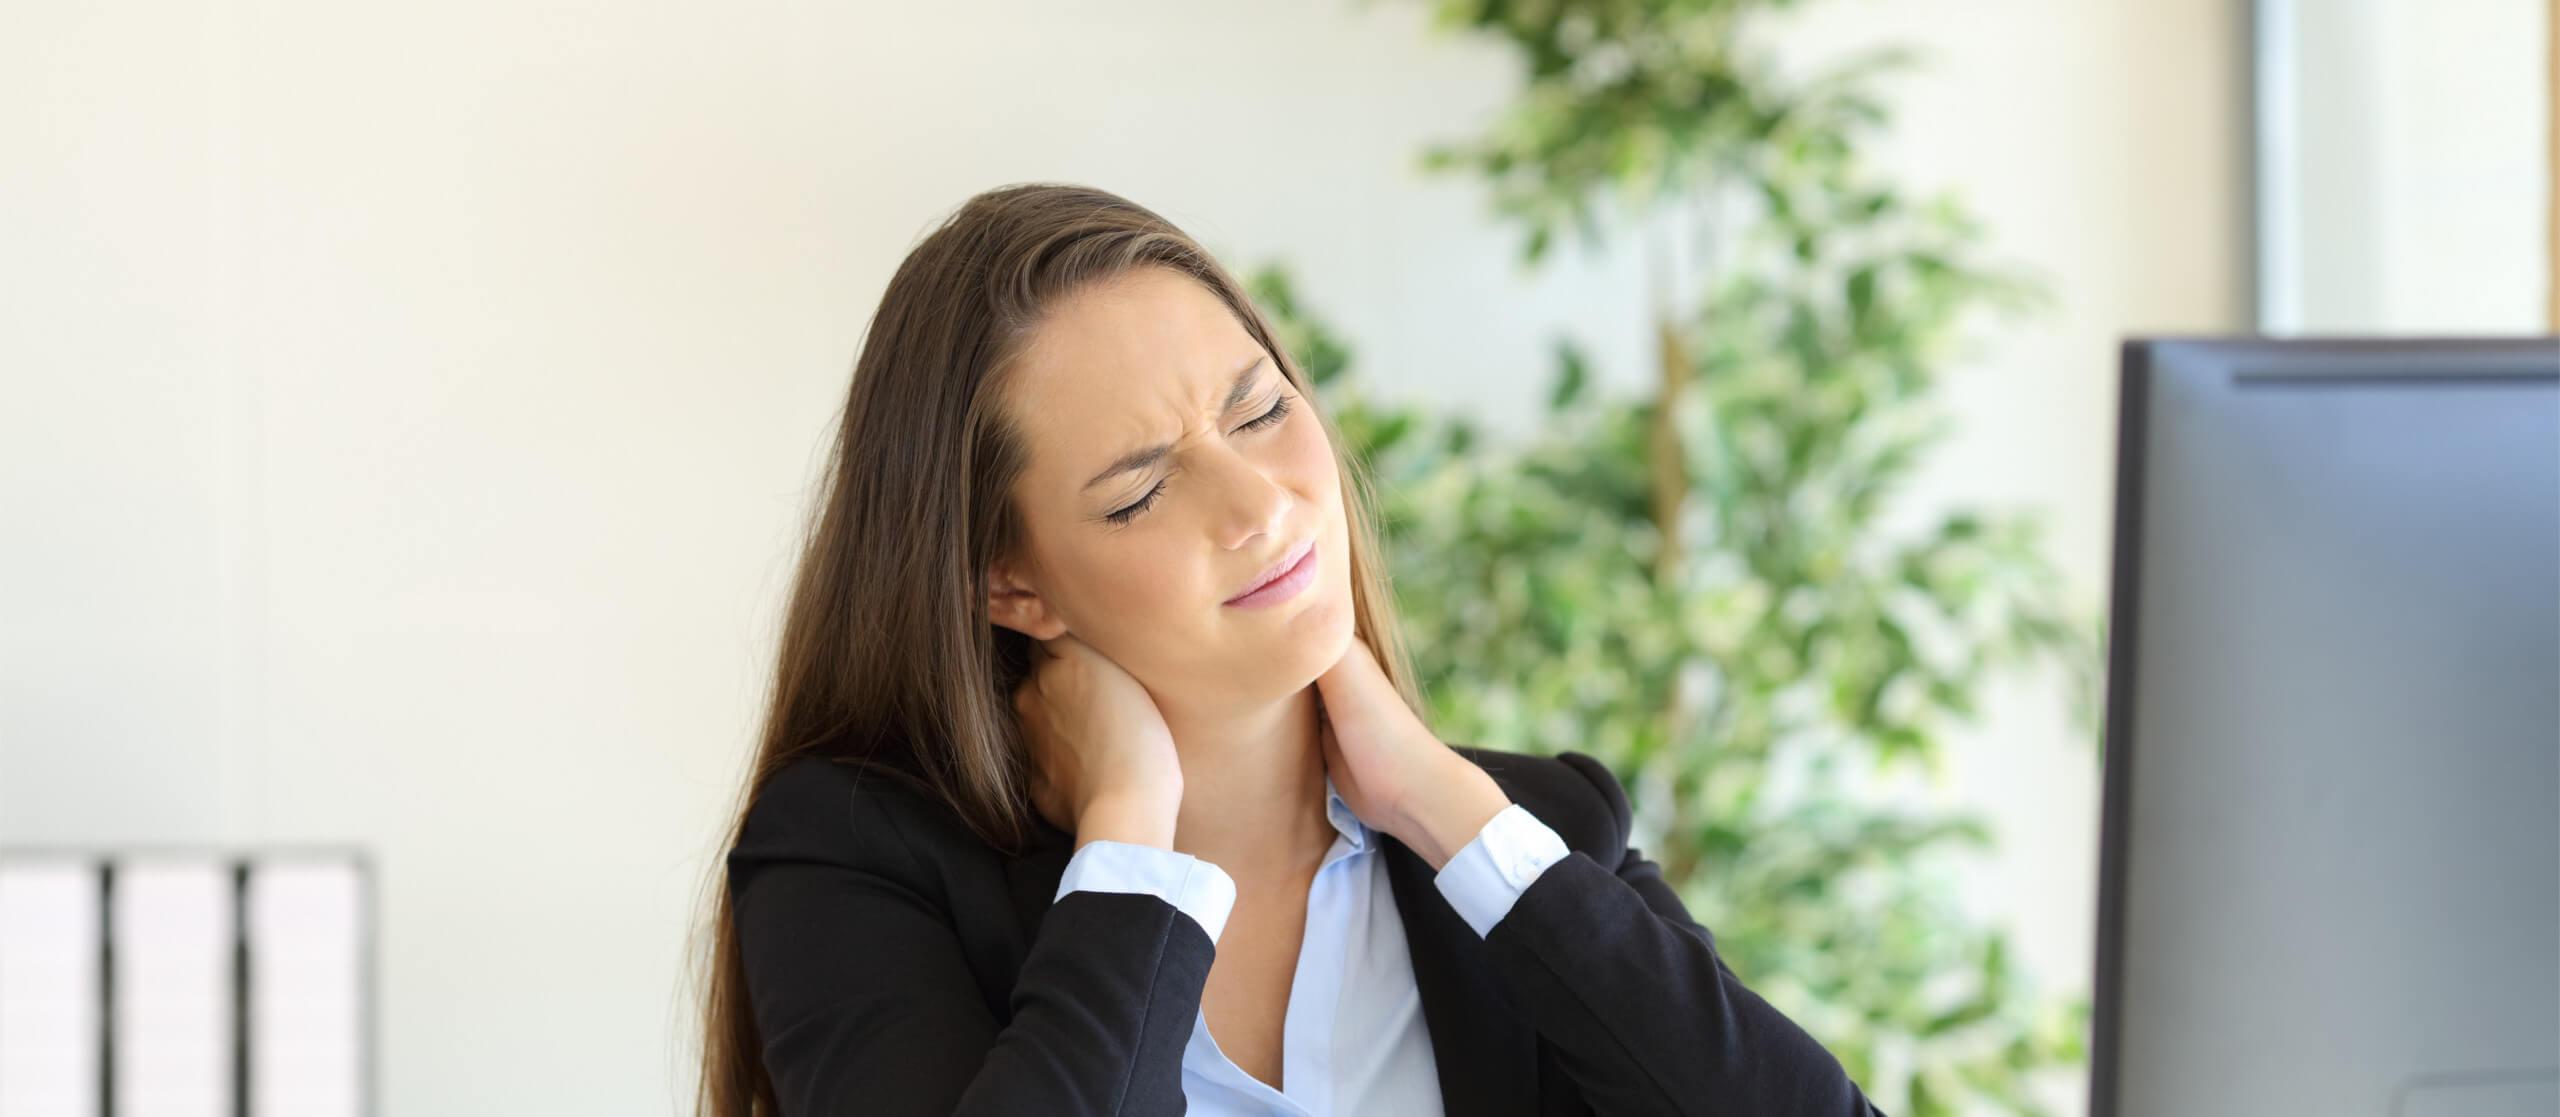 Chronic Neck Pain Woman Grimacing